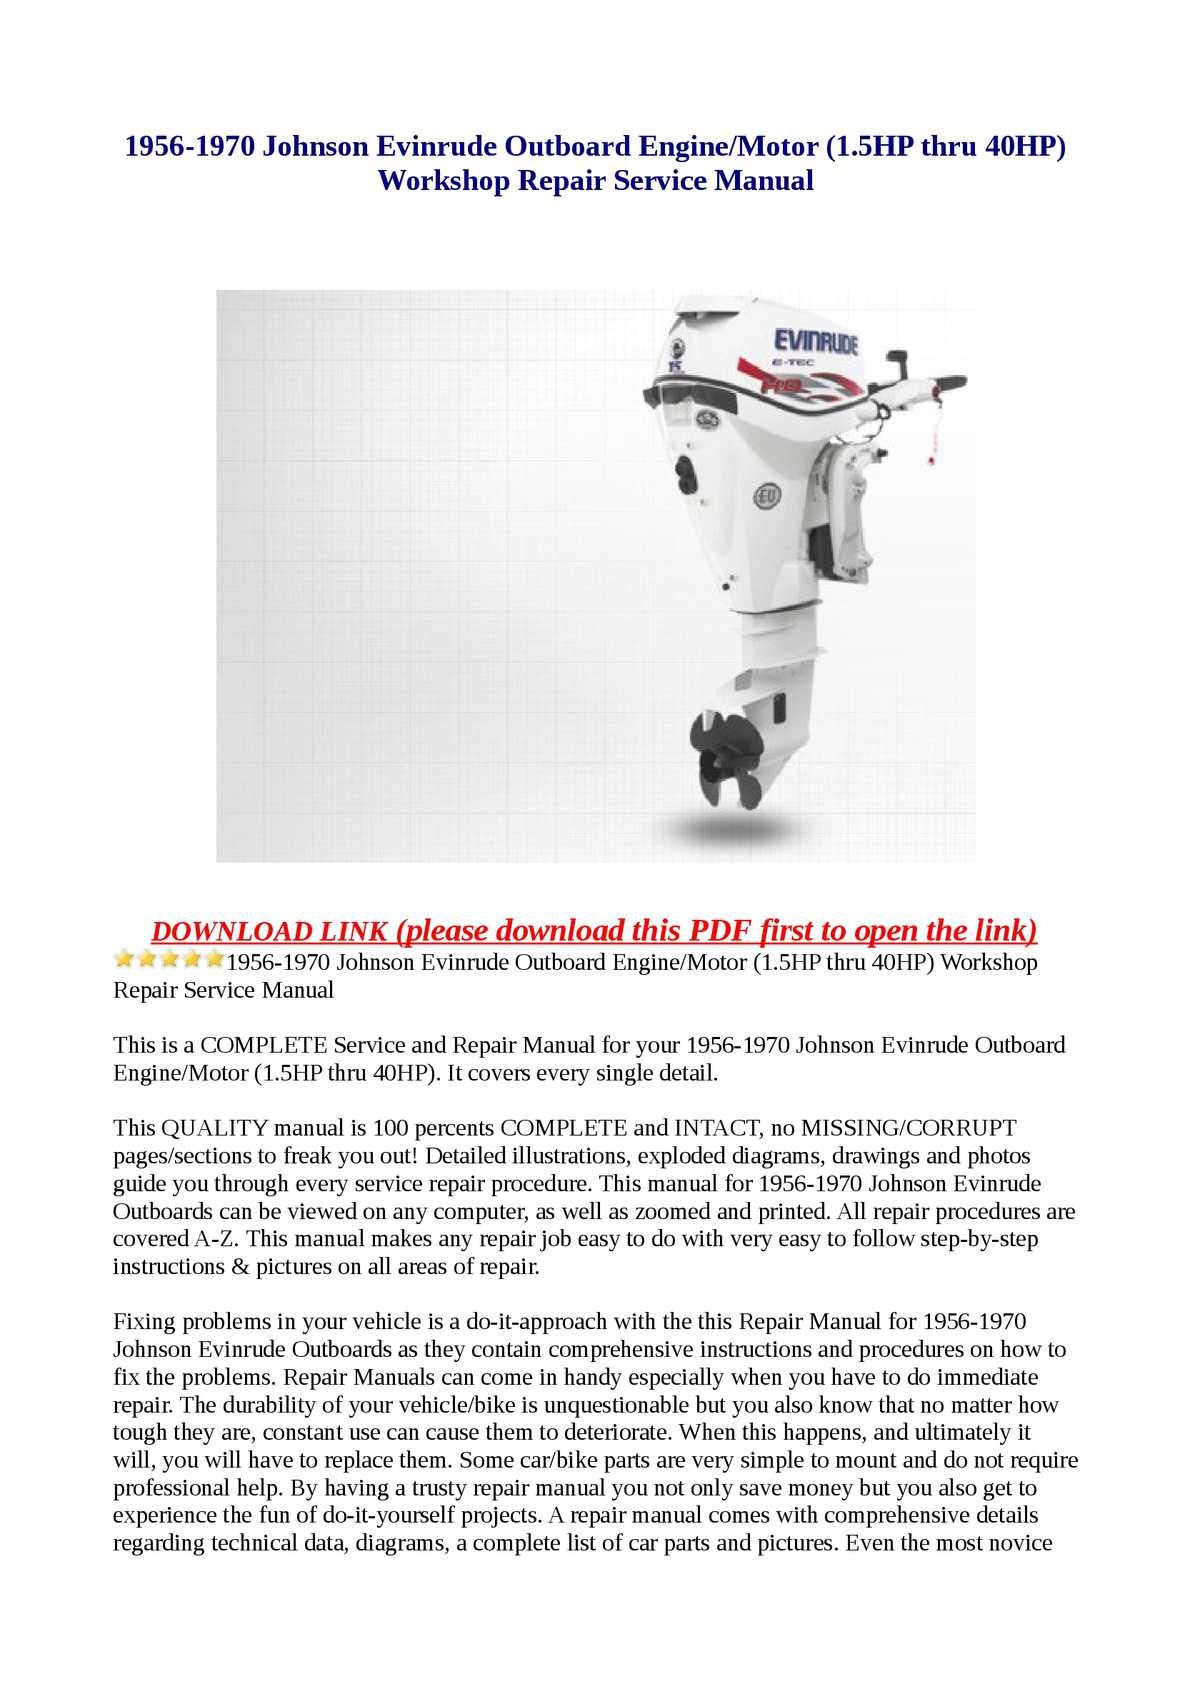 Calaméo - 1956-1970 Johnson Evinrude Outboard Engine/Motor (1.5HP thru  40HP) Workshop Repair Service Manual